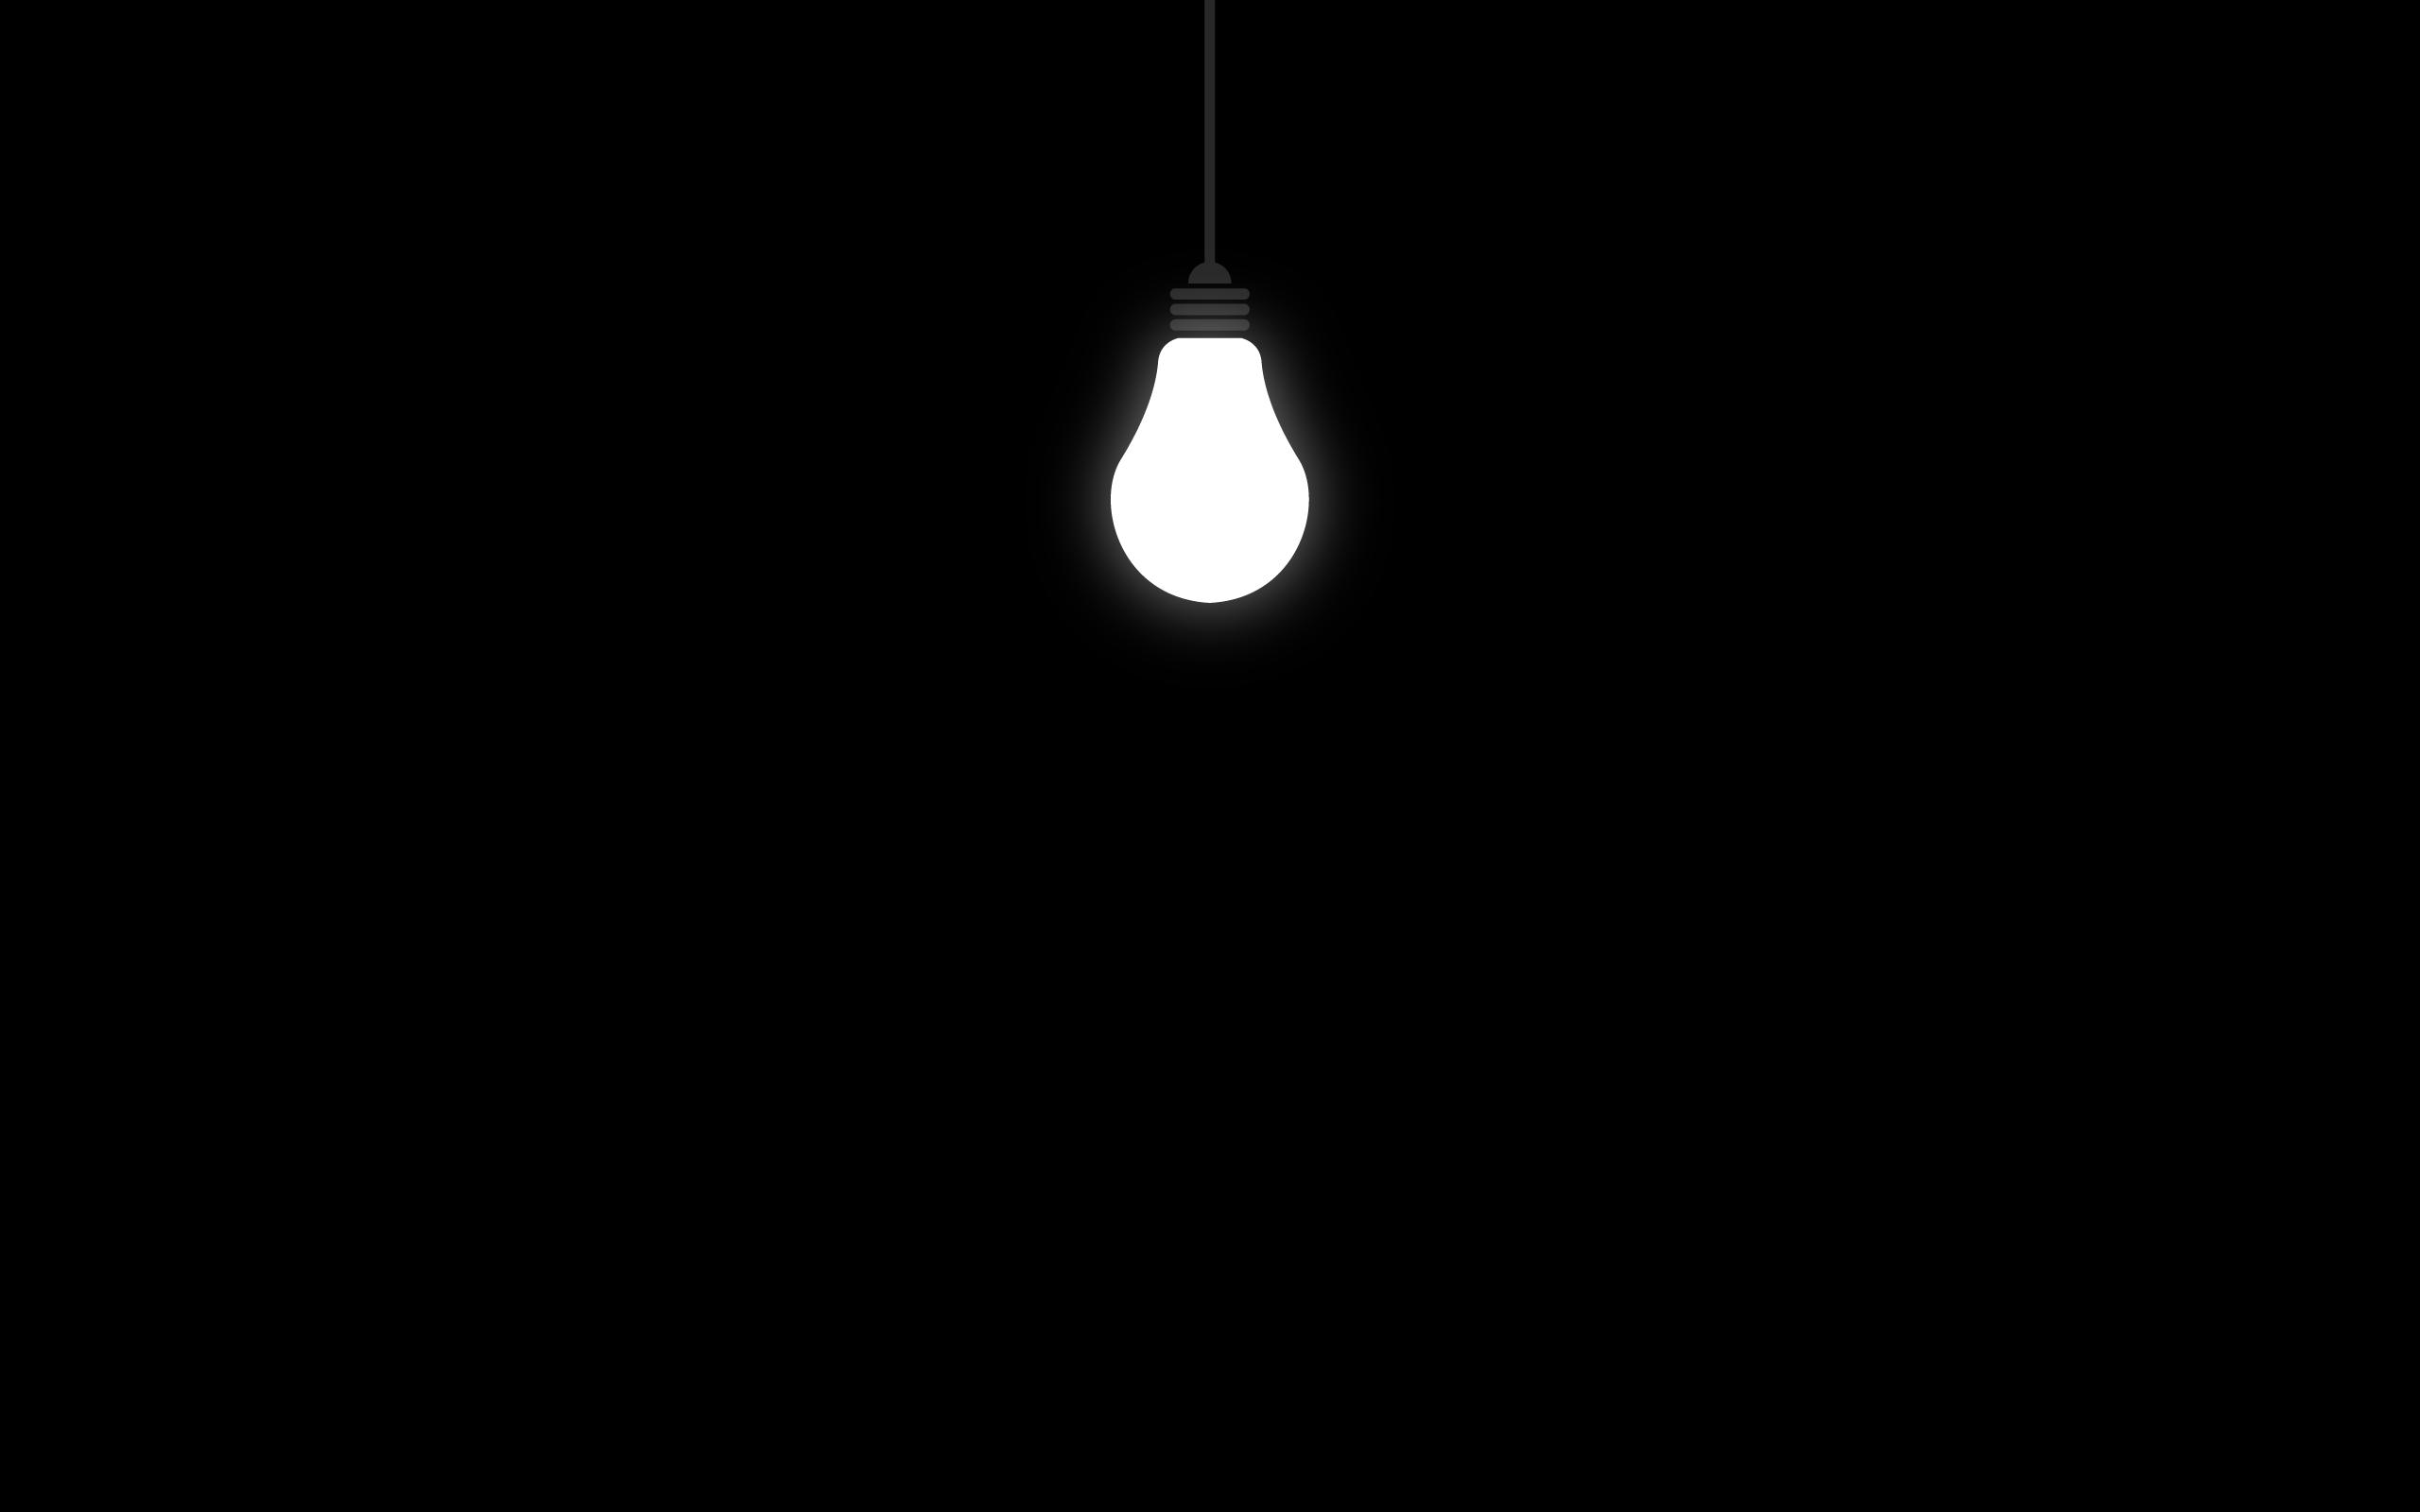 desktop wallpaper black